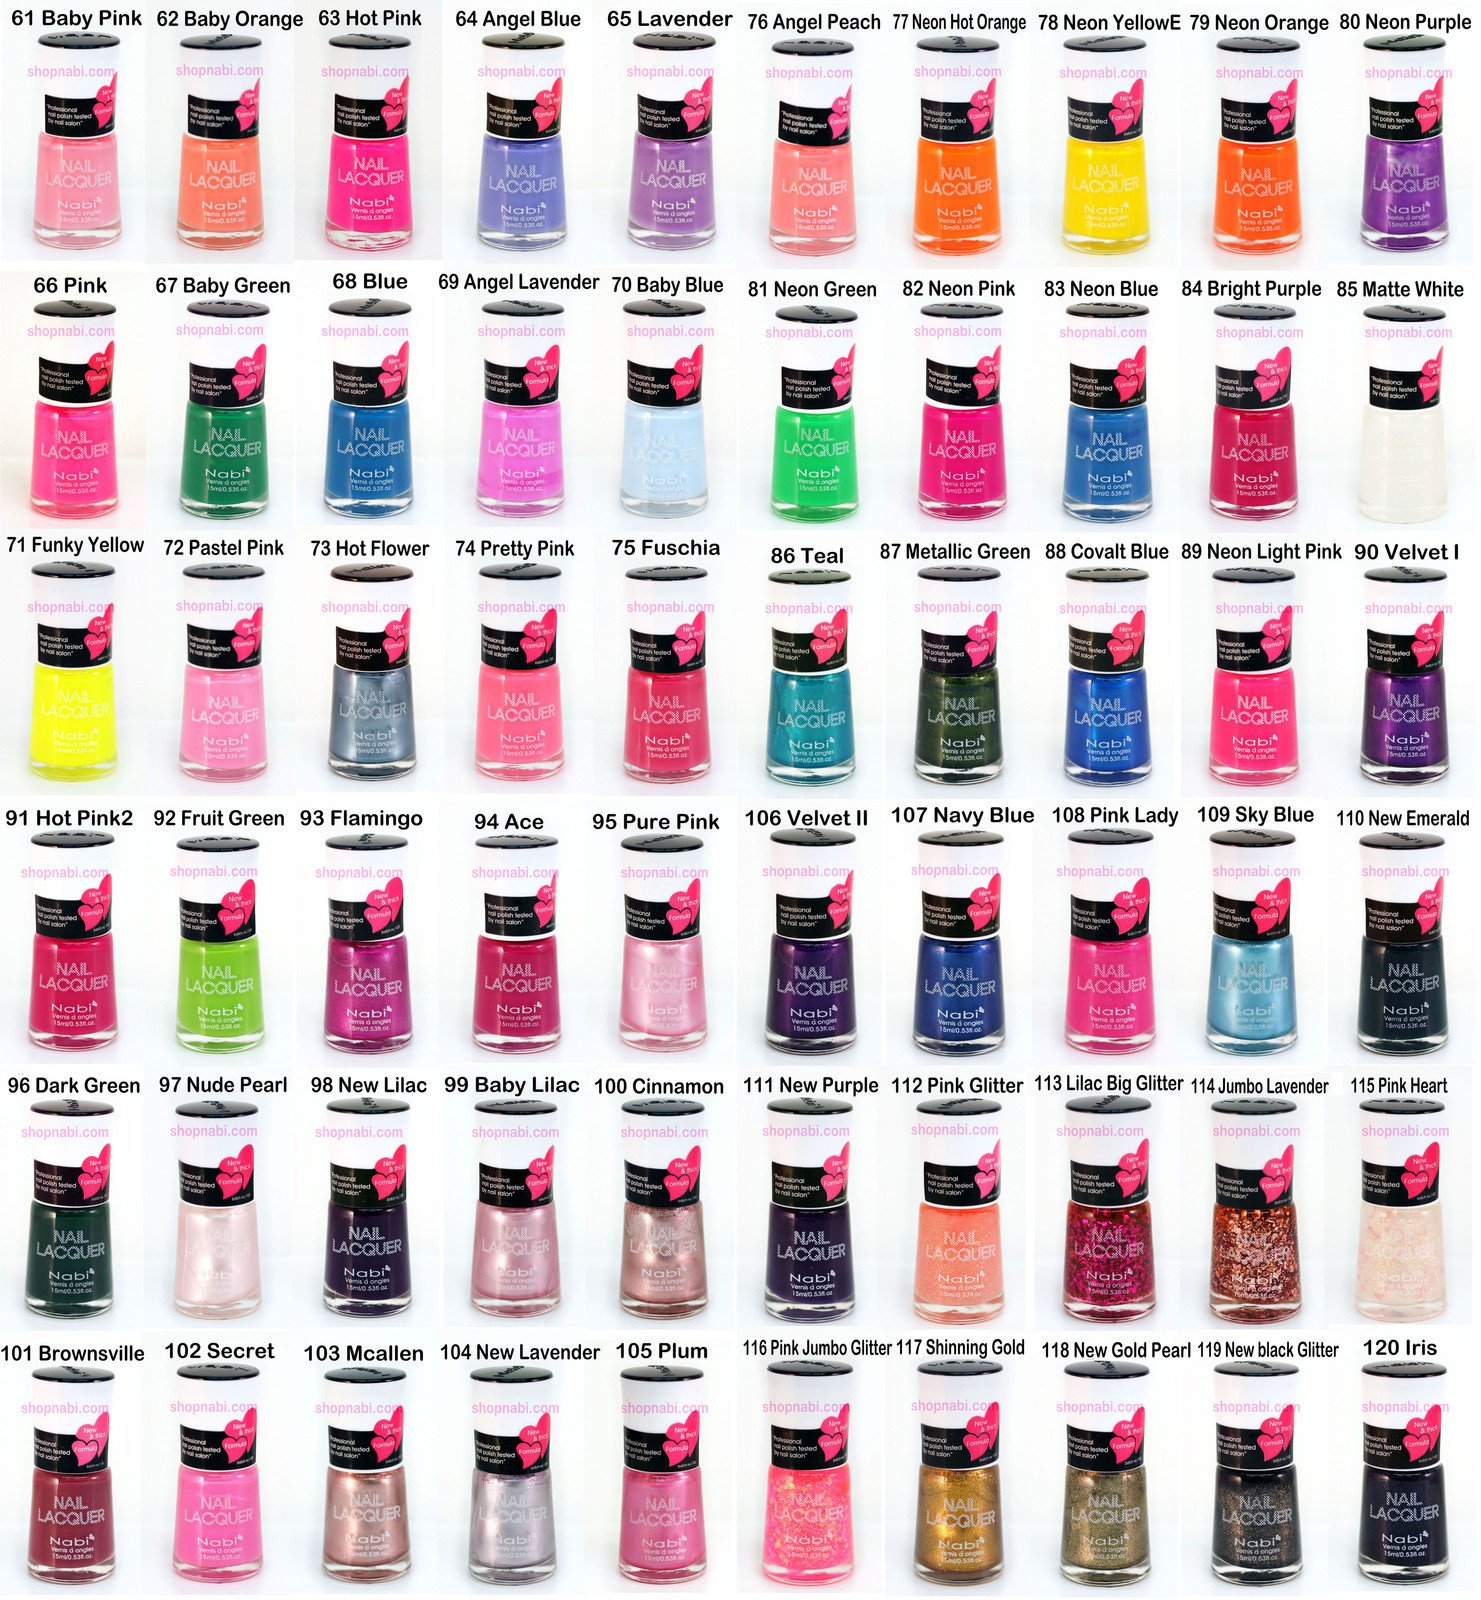 144pcs Nail Manicure Nabi Nail Polish (Wholesale Lot)